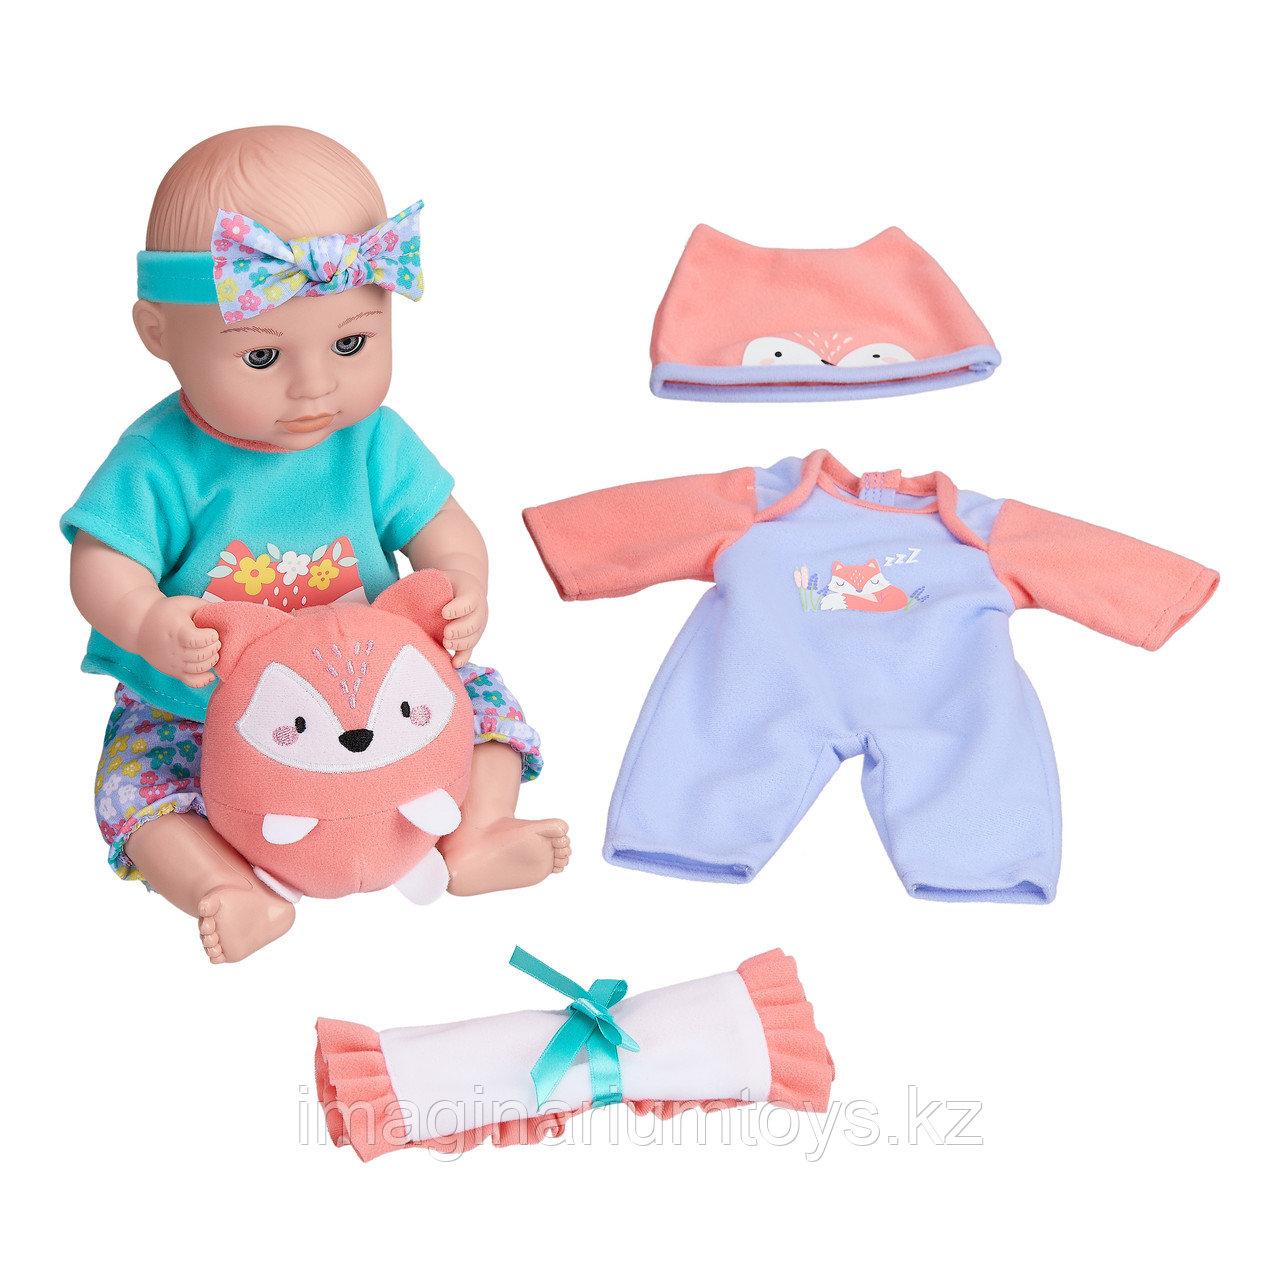 Кукла пупс с комплектом одежды My Sweet Love